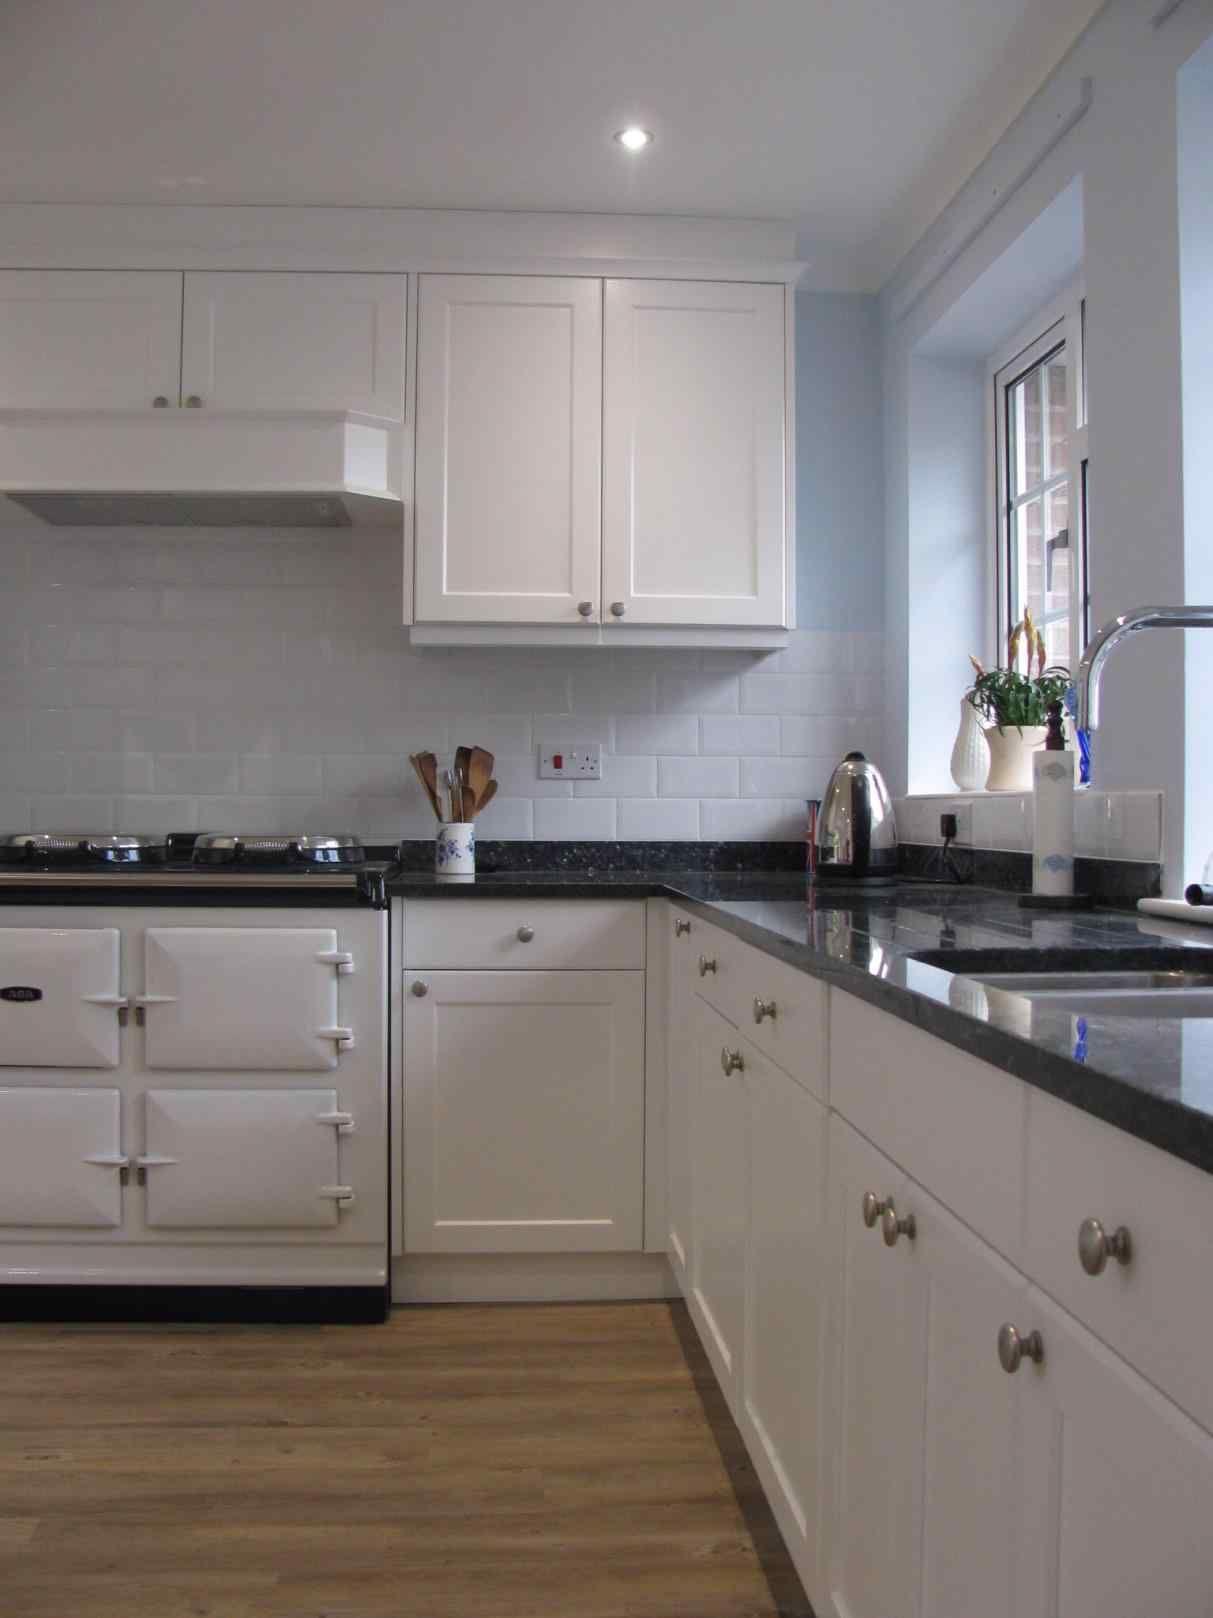 white kitchen cabinets with gray granite countertops ... on Kitchen Backsplash With Black Granite Countertops  id=55387